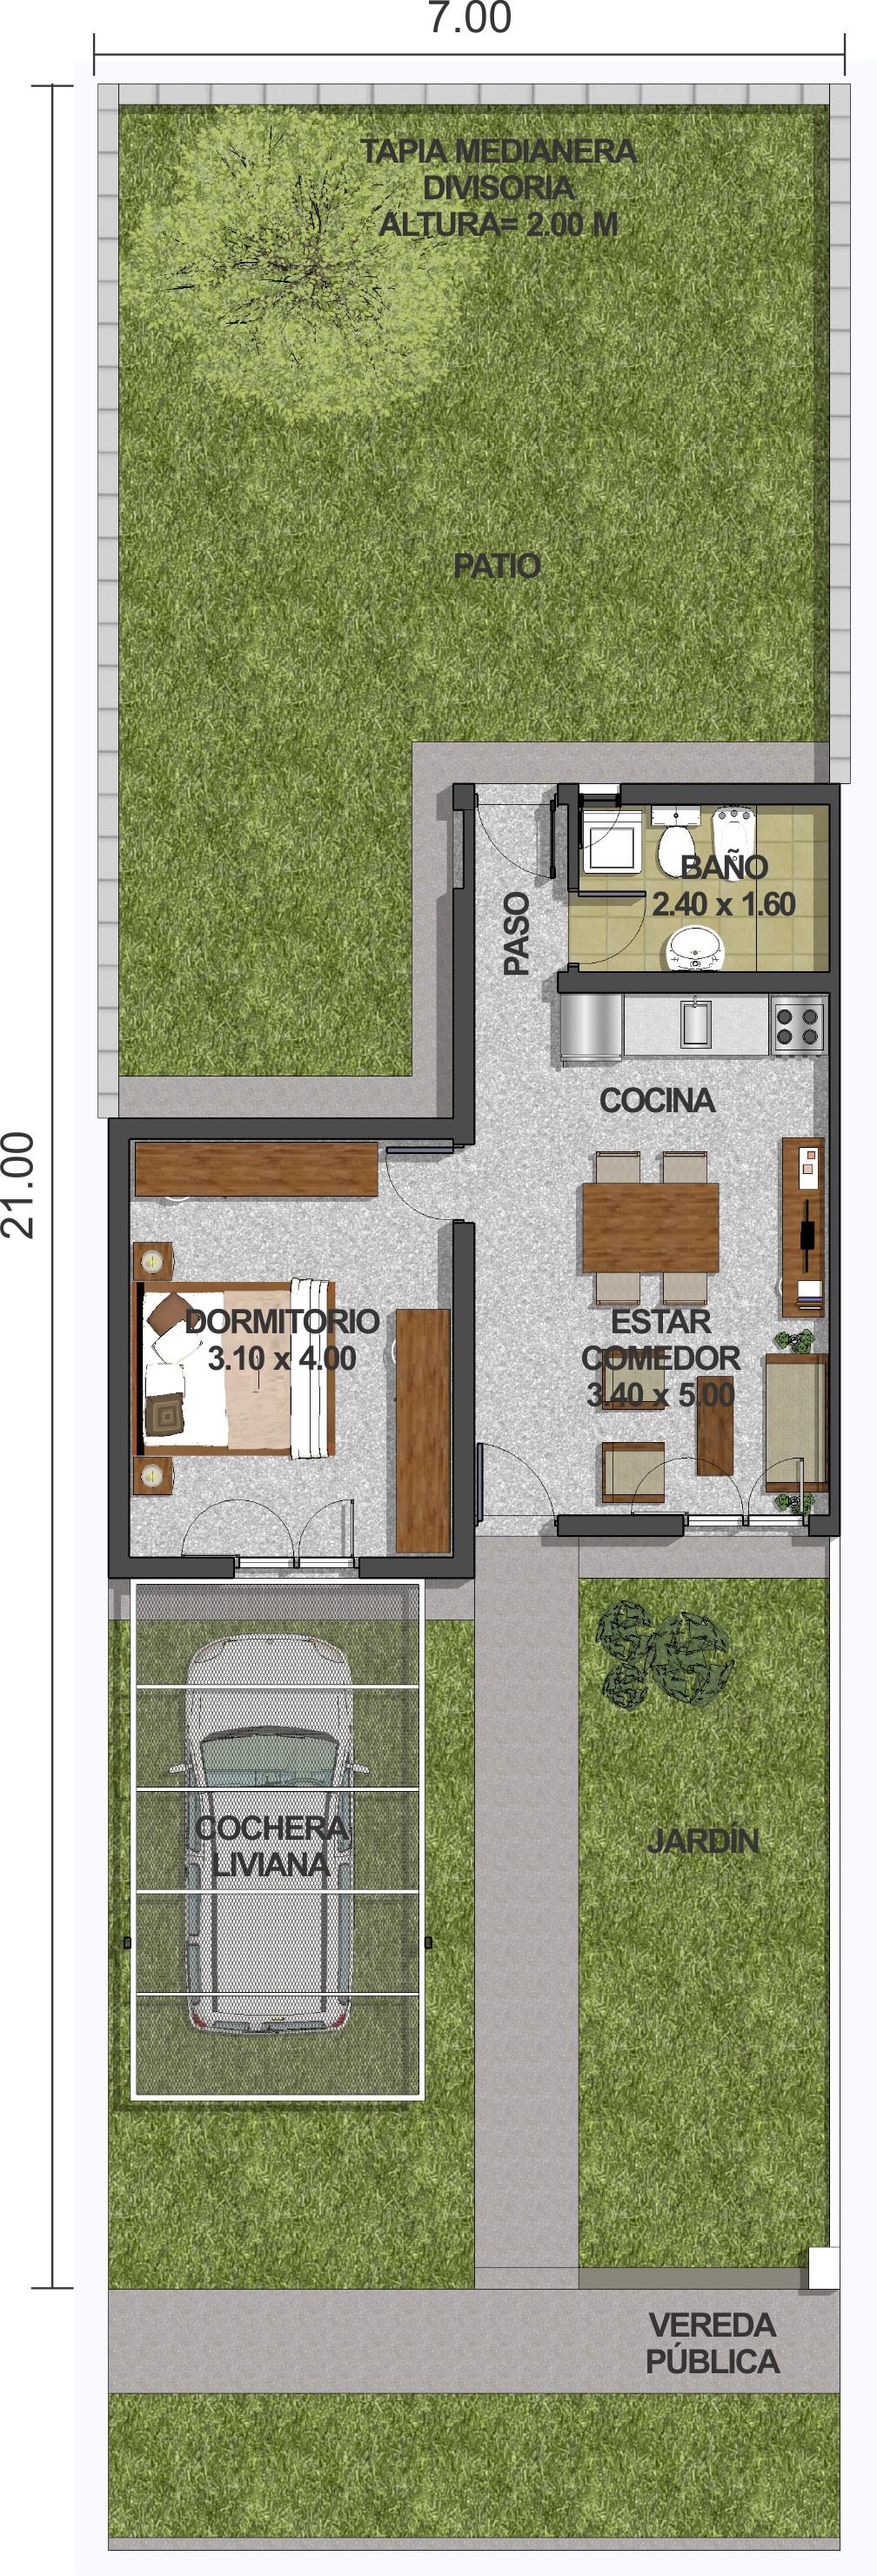 V-COMPACTA-1 dormitorio_r1_c1